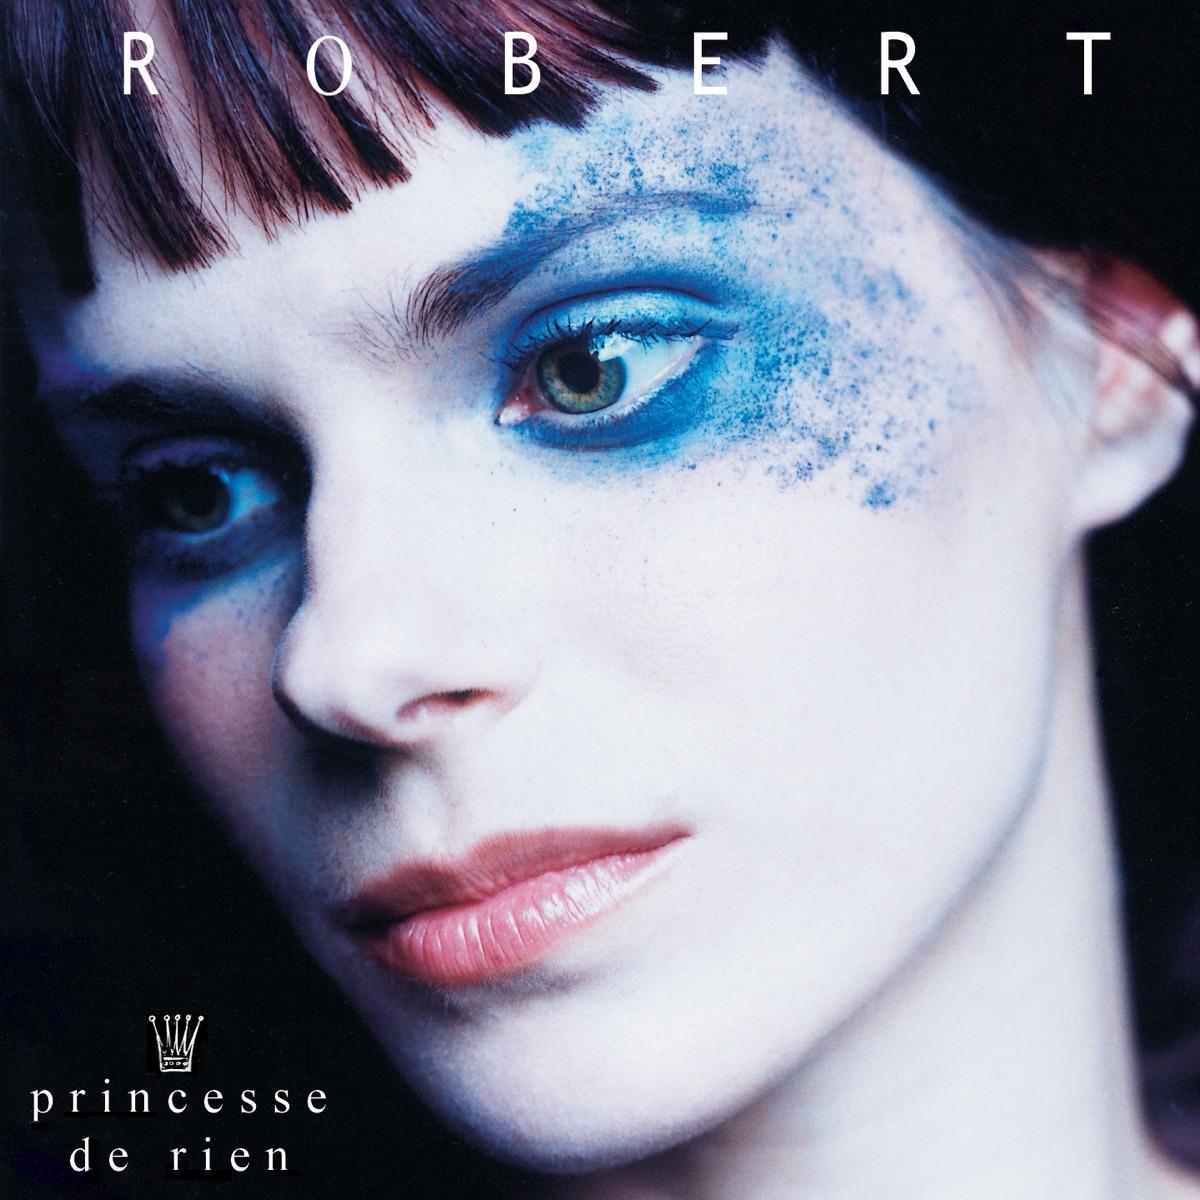 Princesse de rien Robert CD cover